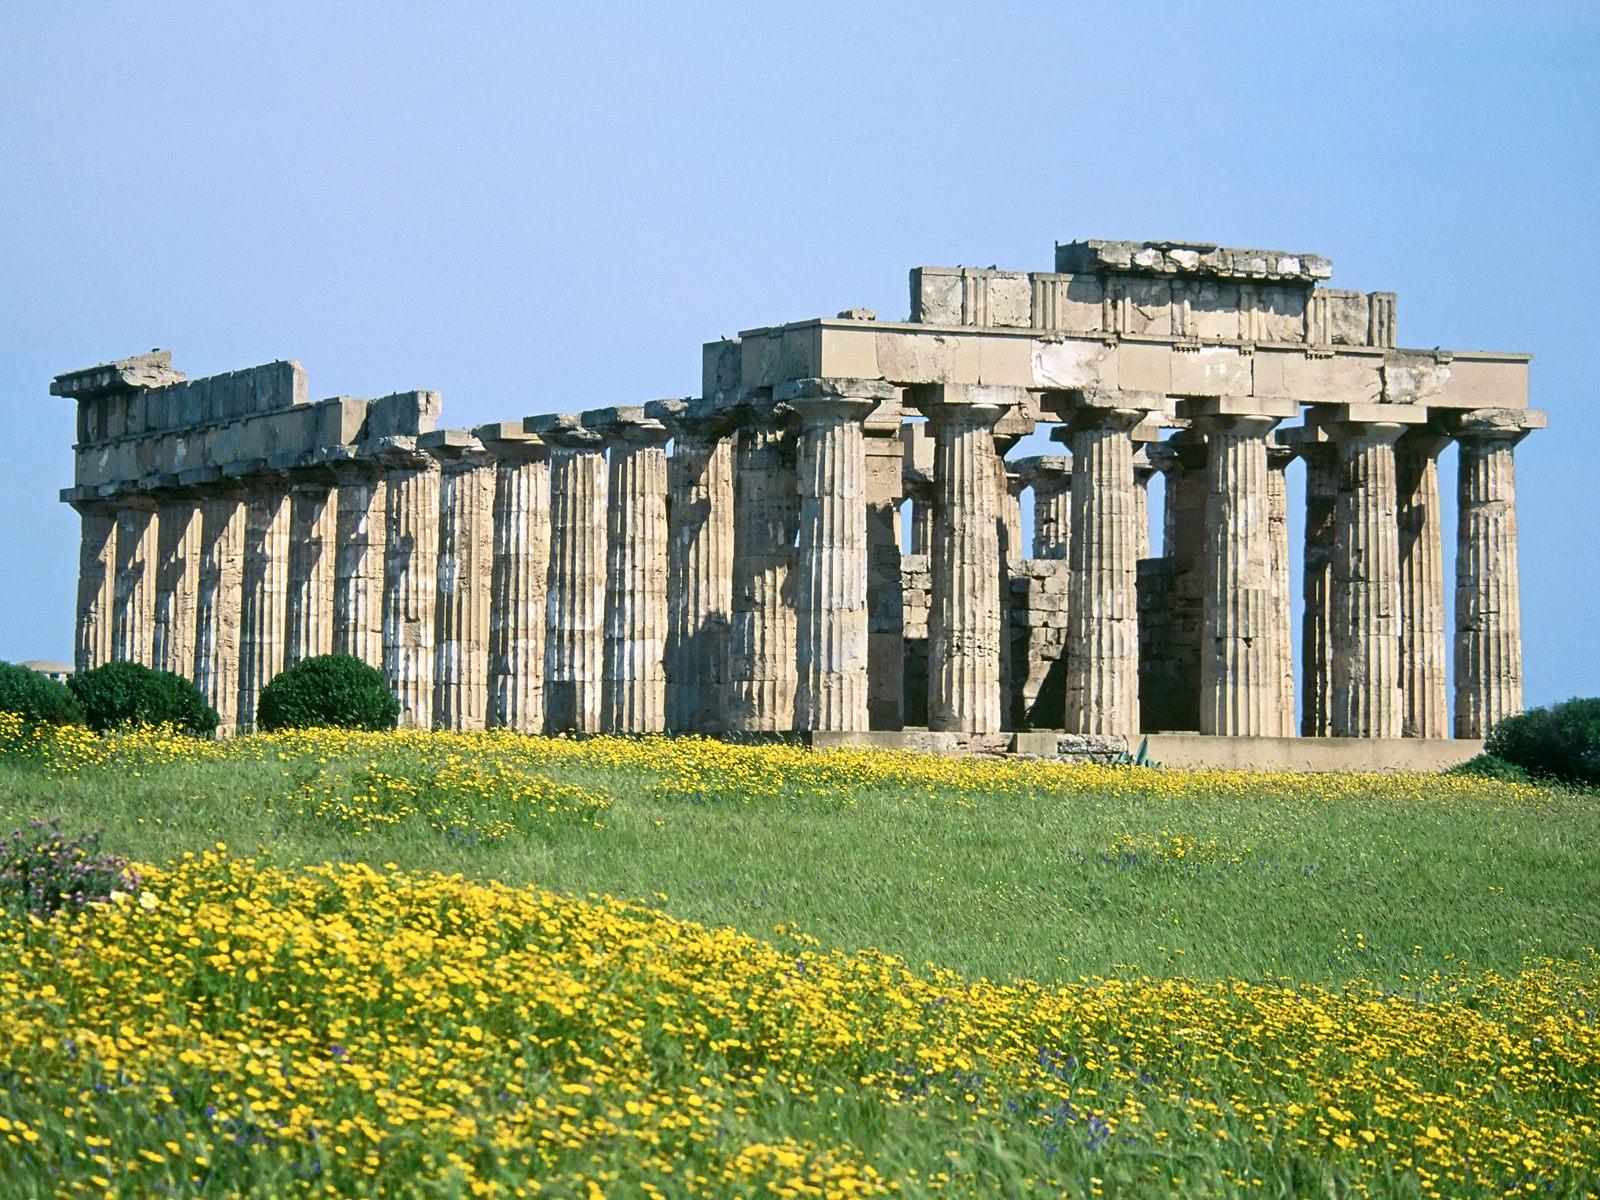 http://4.bp.blogspot.com/-A6bqrIskJ7Q/Tcp4kfrN3UI/AAAAAAAACX0/n1ofC6vMg1s/s1600/Selinunte%252C+Sicily%252C+Italy.jpg